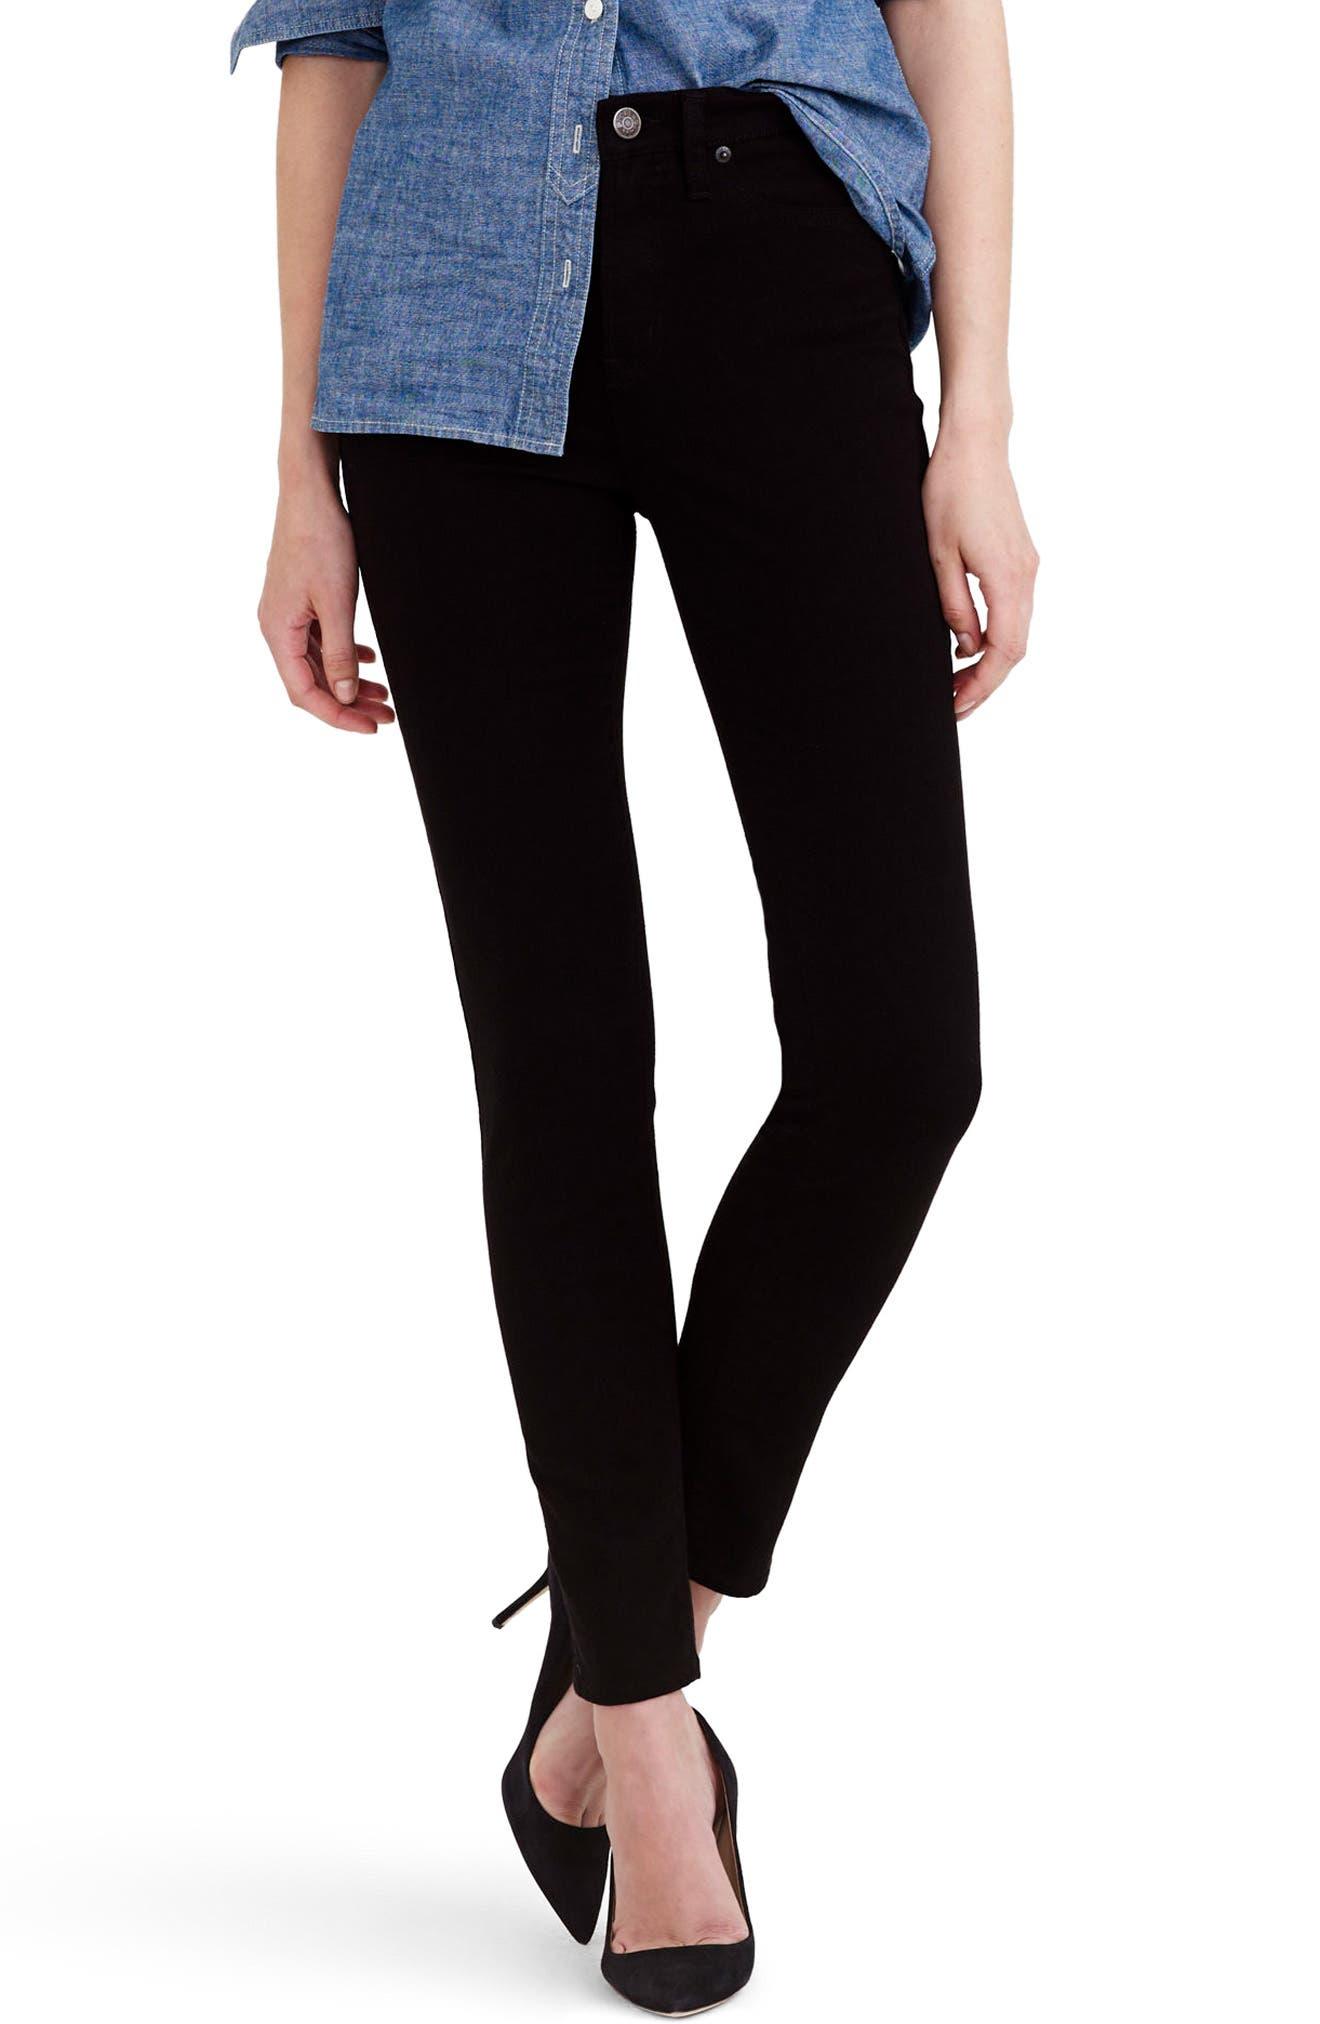 Lookout High Rise Jeans,                         Main,                         color, True Black